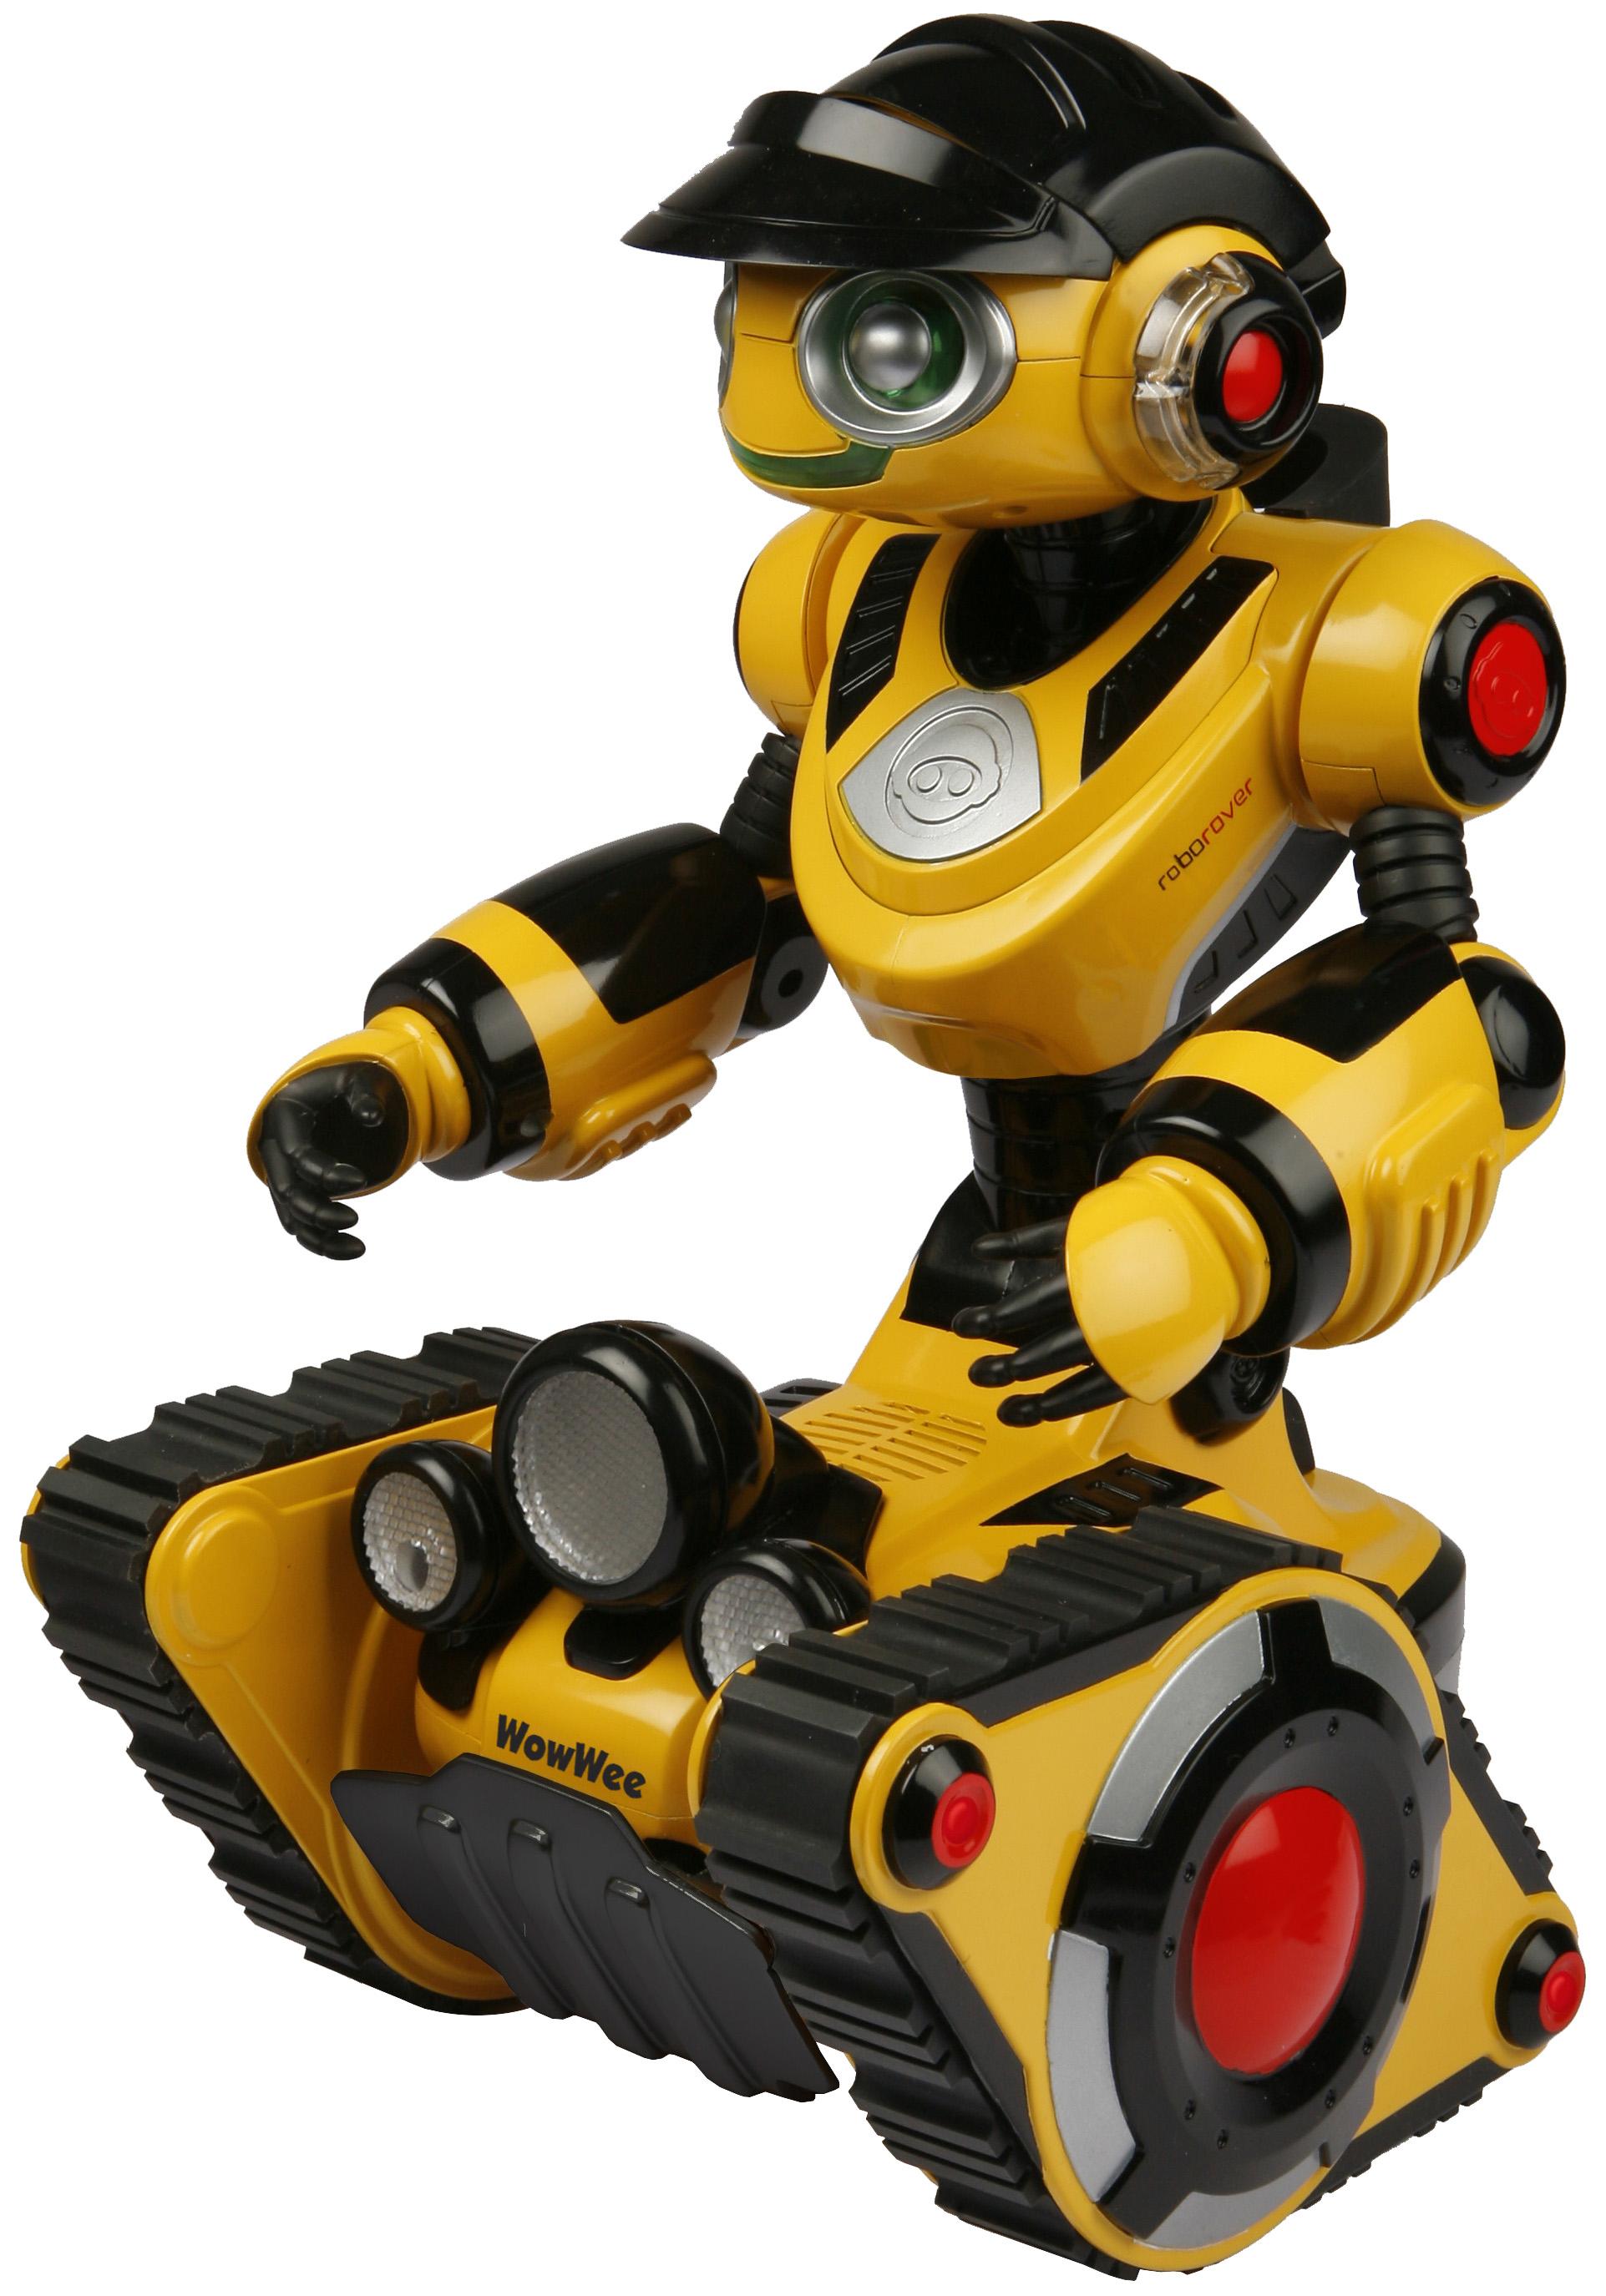 Интерактивный робот WowWee Роборовер 8515 фото